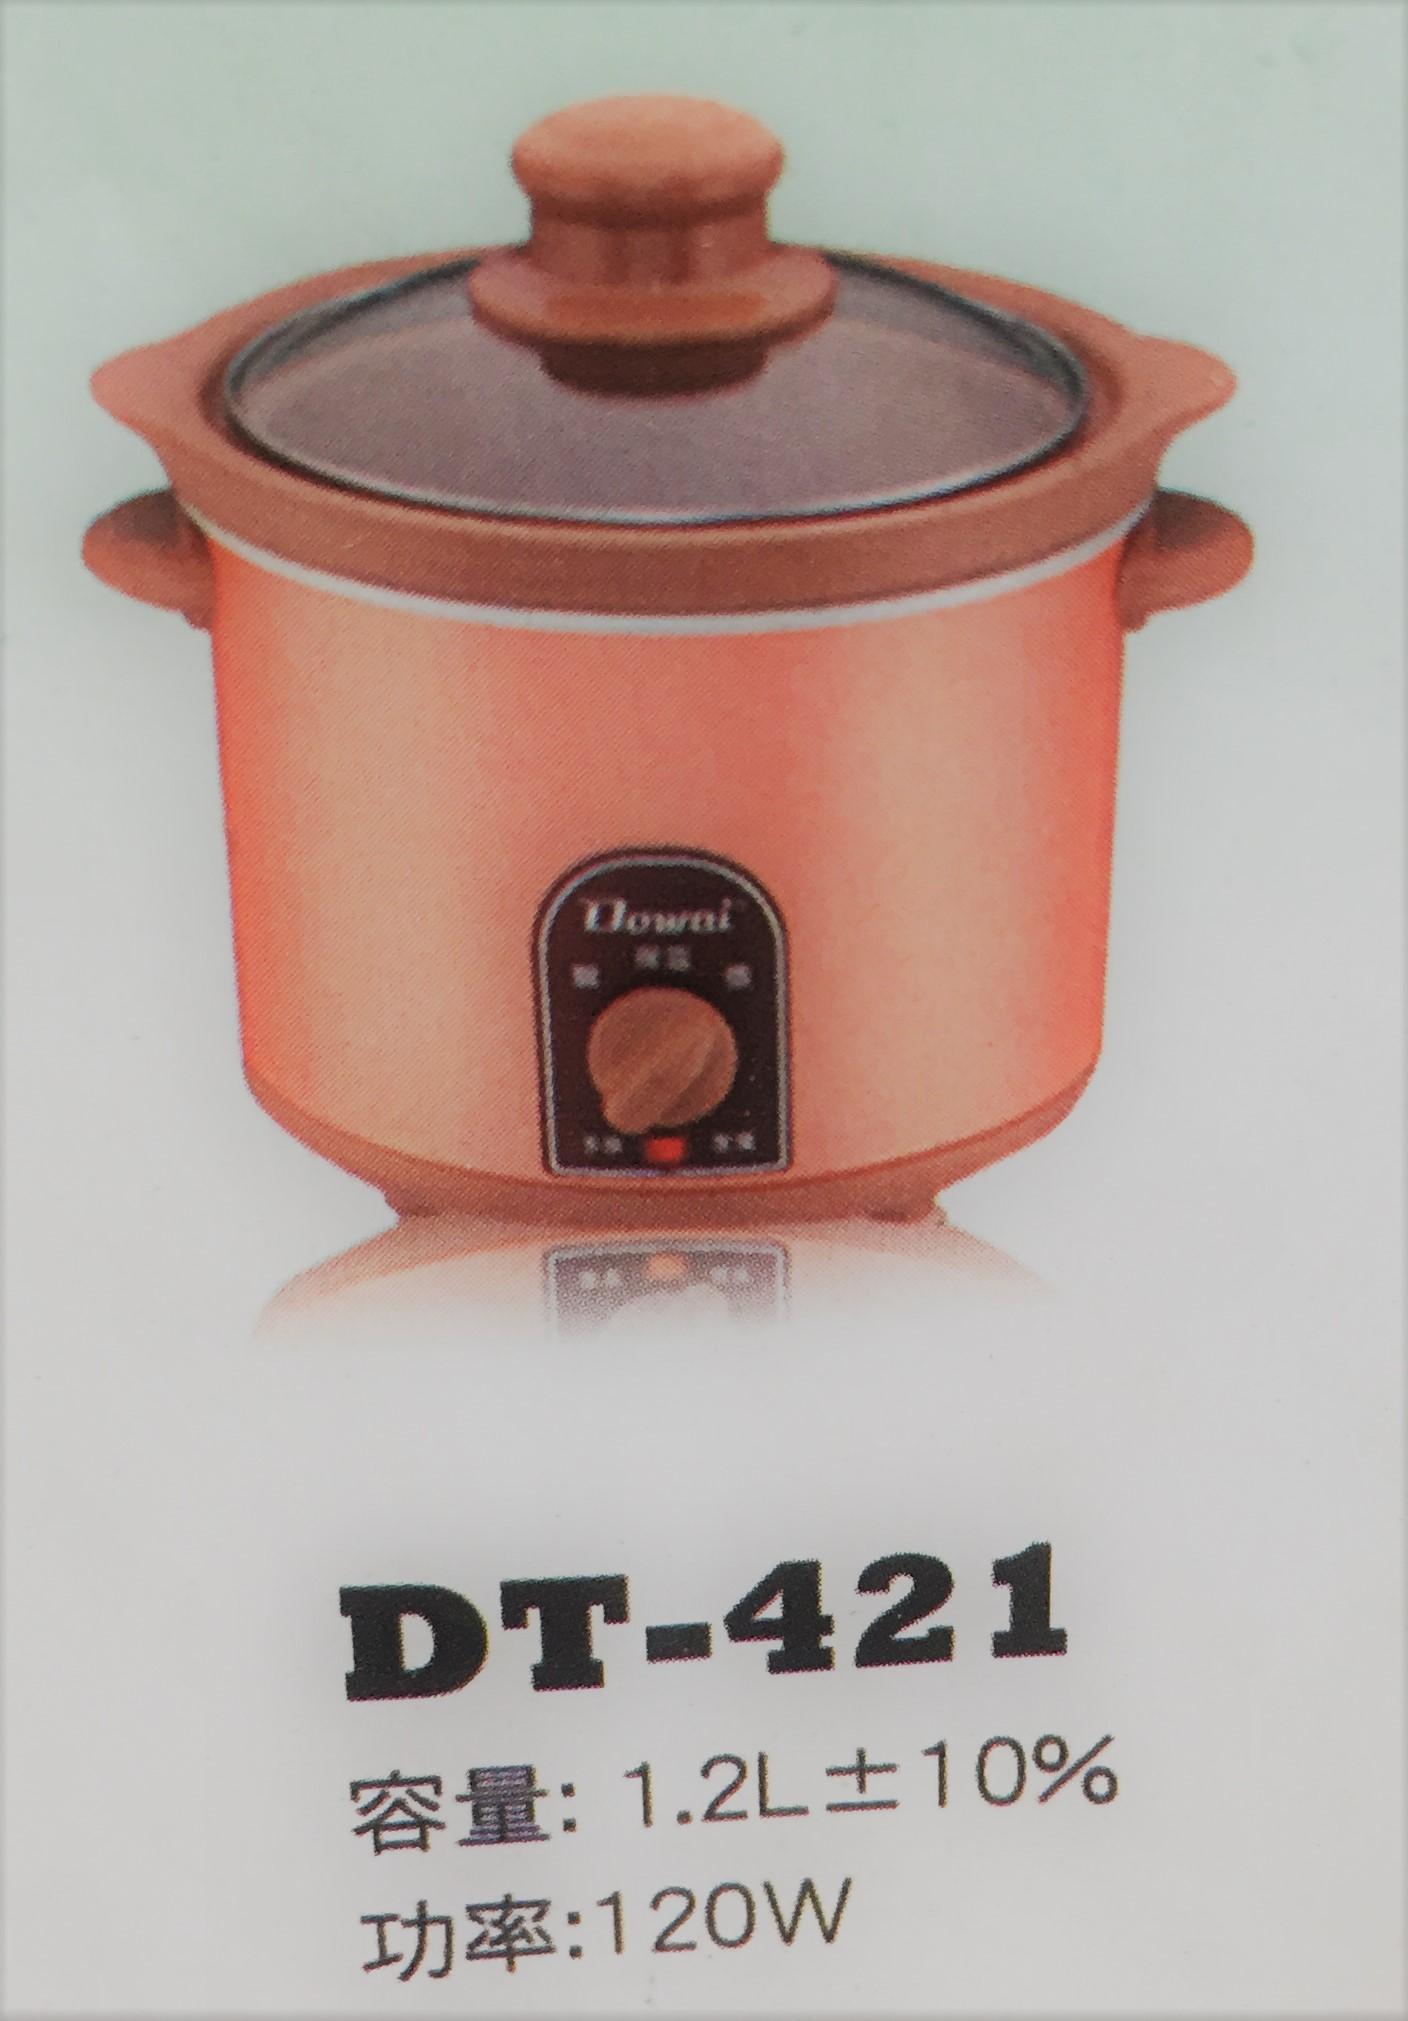 DT-421